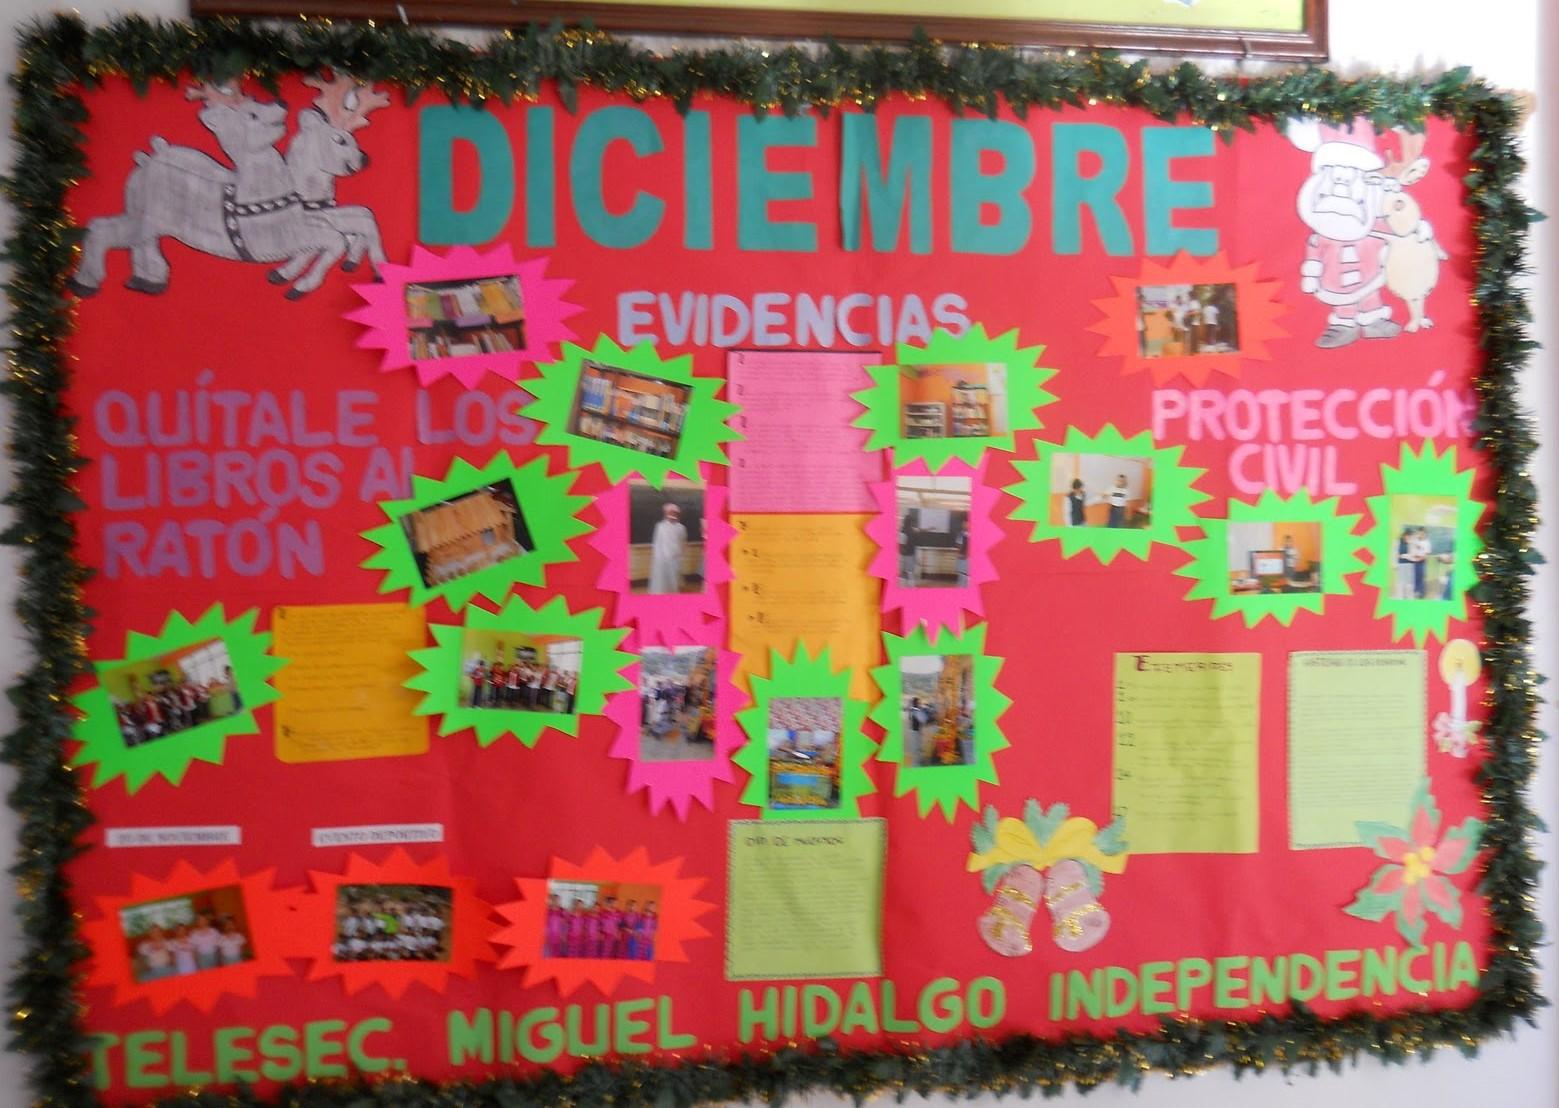 Periodico mural diciembre 6 imagenes educativas for Editorial de un periodico mural